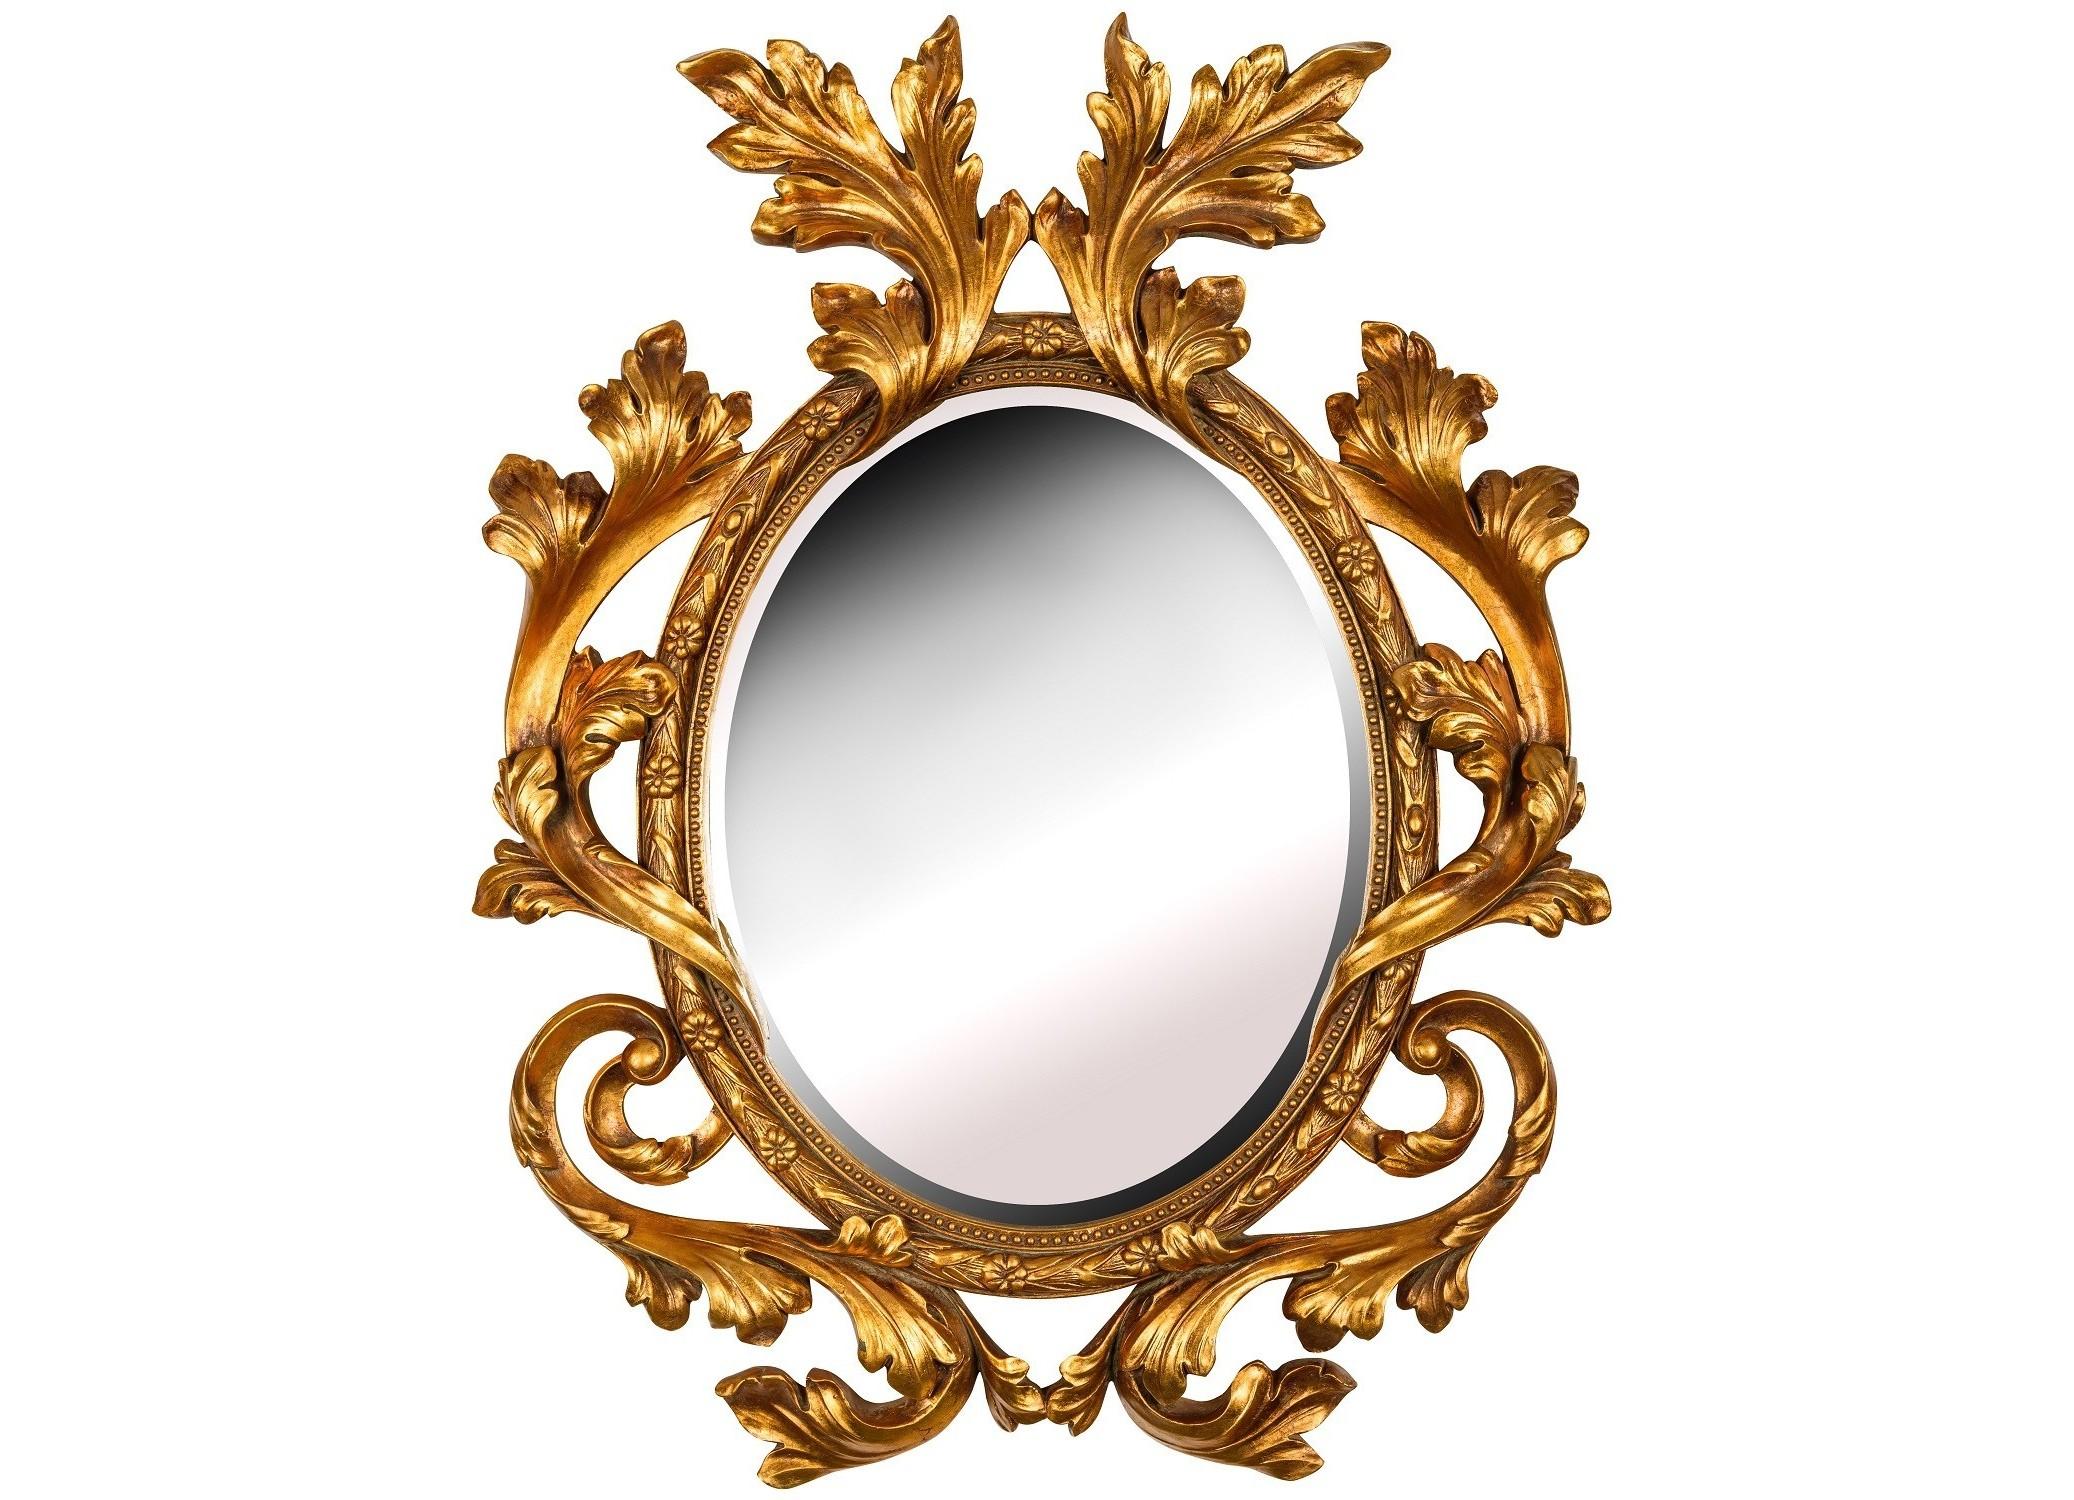 Зеркало Glory GoldНастенные зеркала<br><br><br>Material: Полирезин<br>Width см: 69<br>Depth см: 5<br>Height см: 87